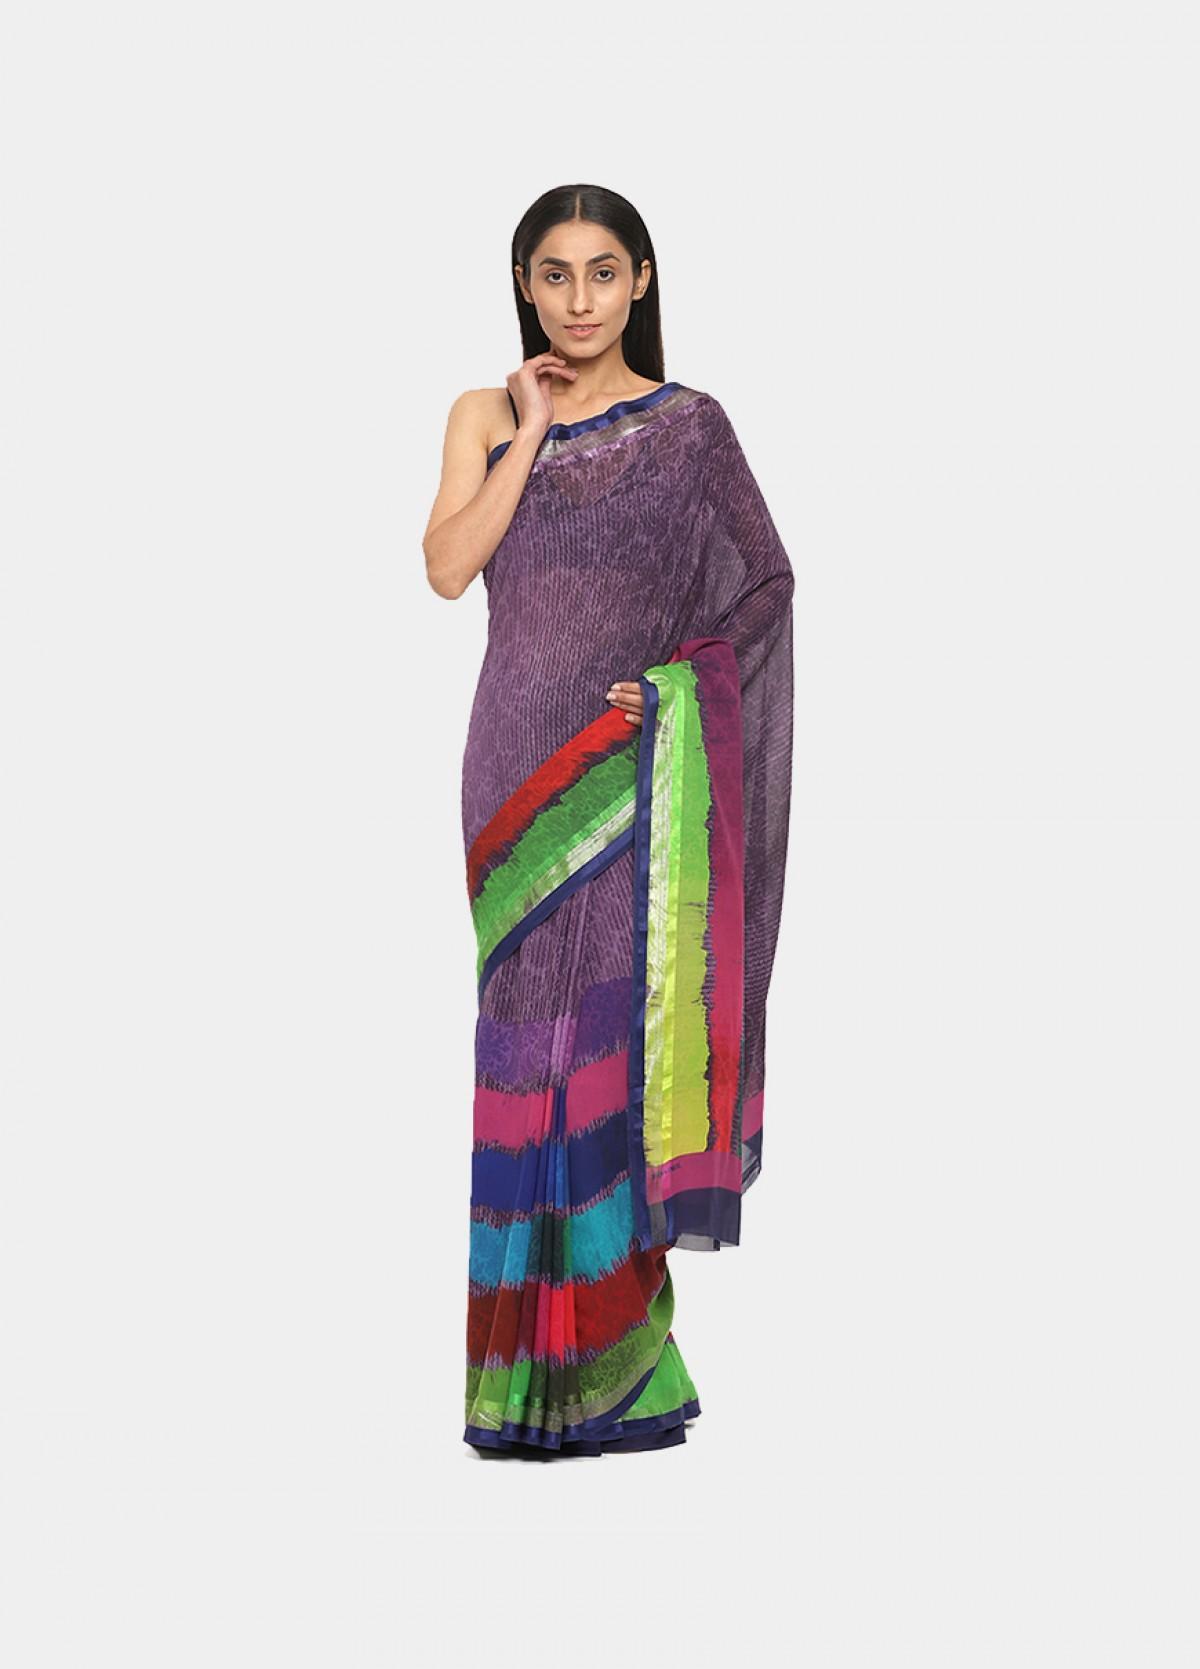 The Multi Colour Traditional Sari